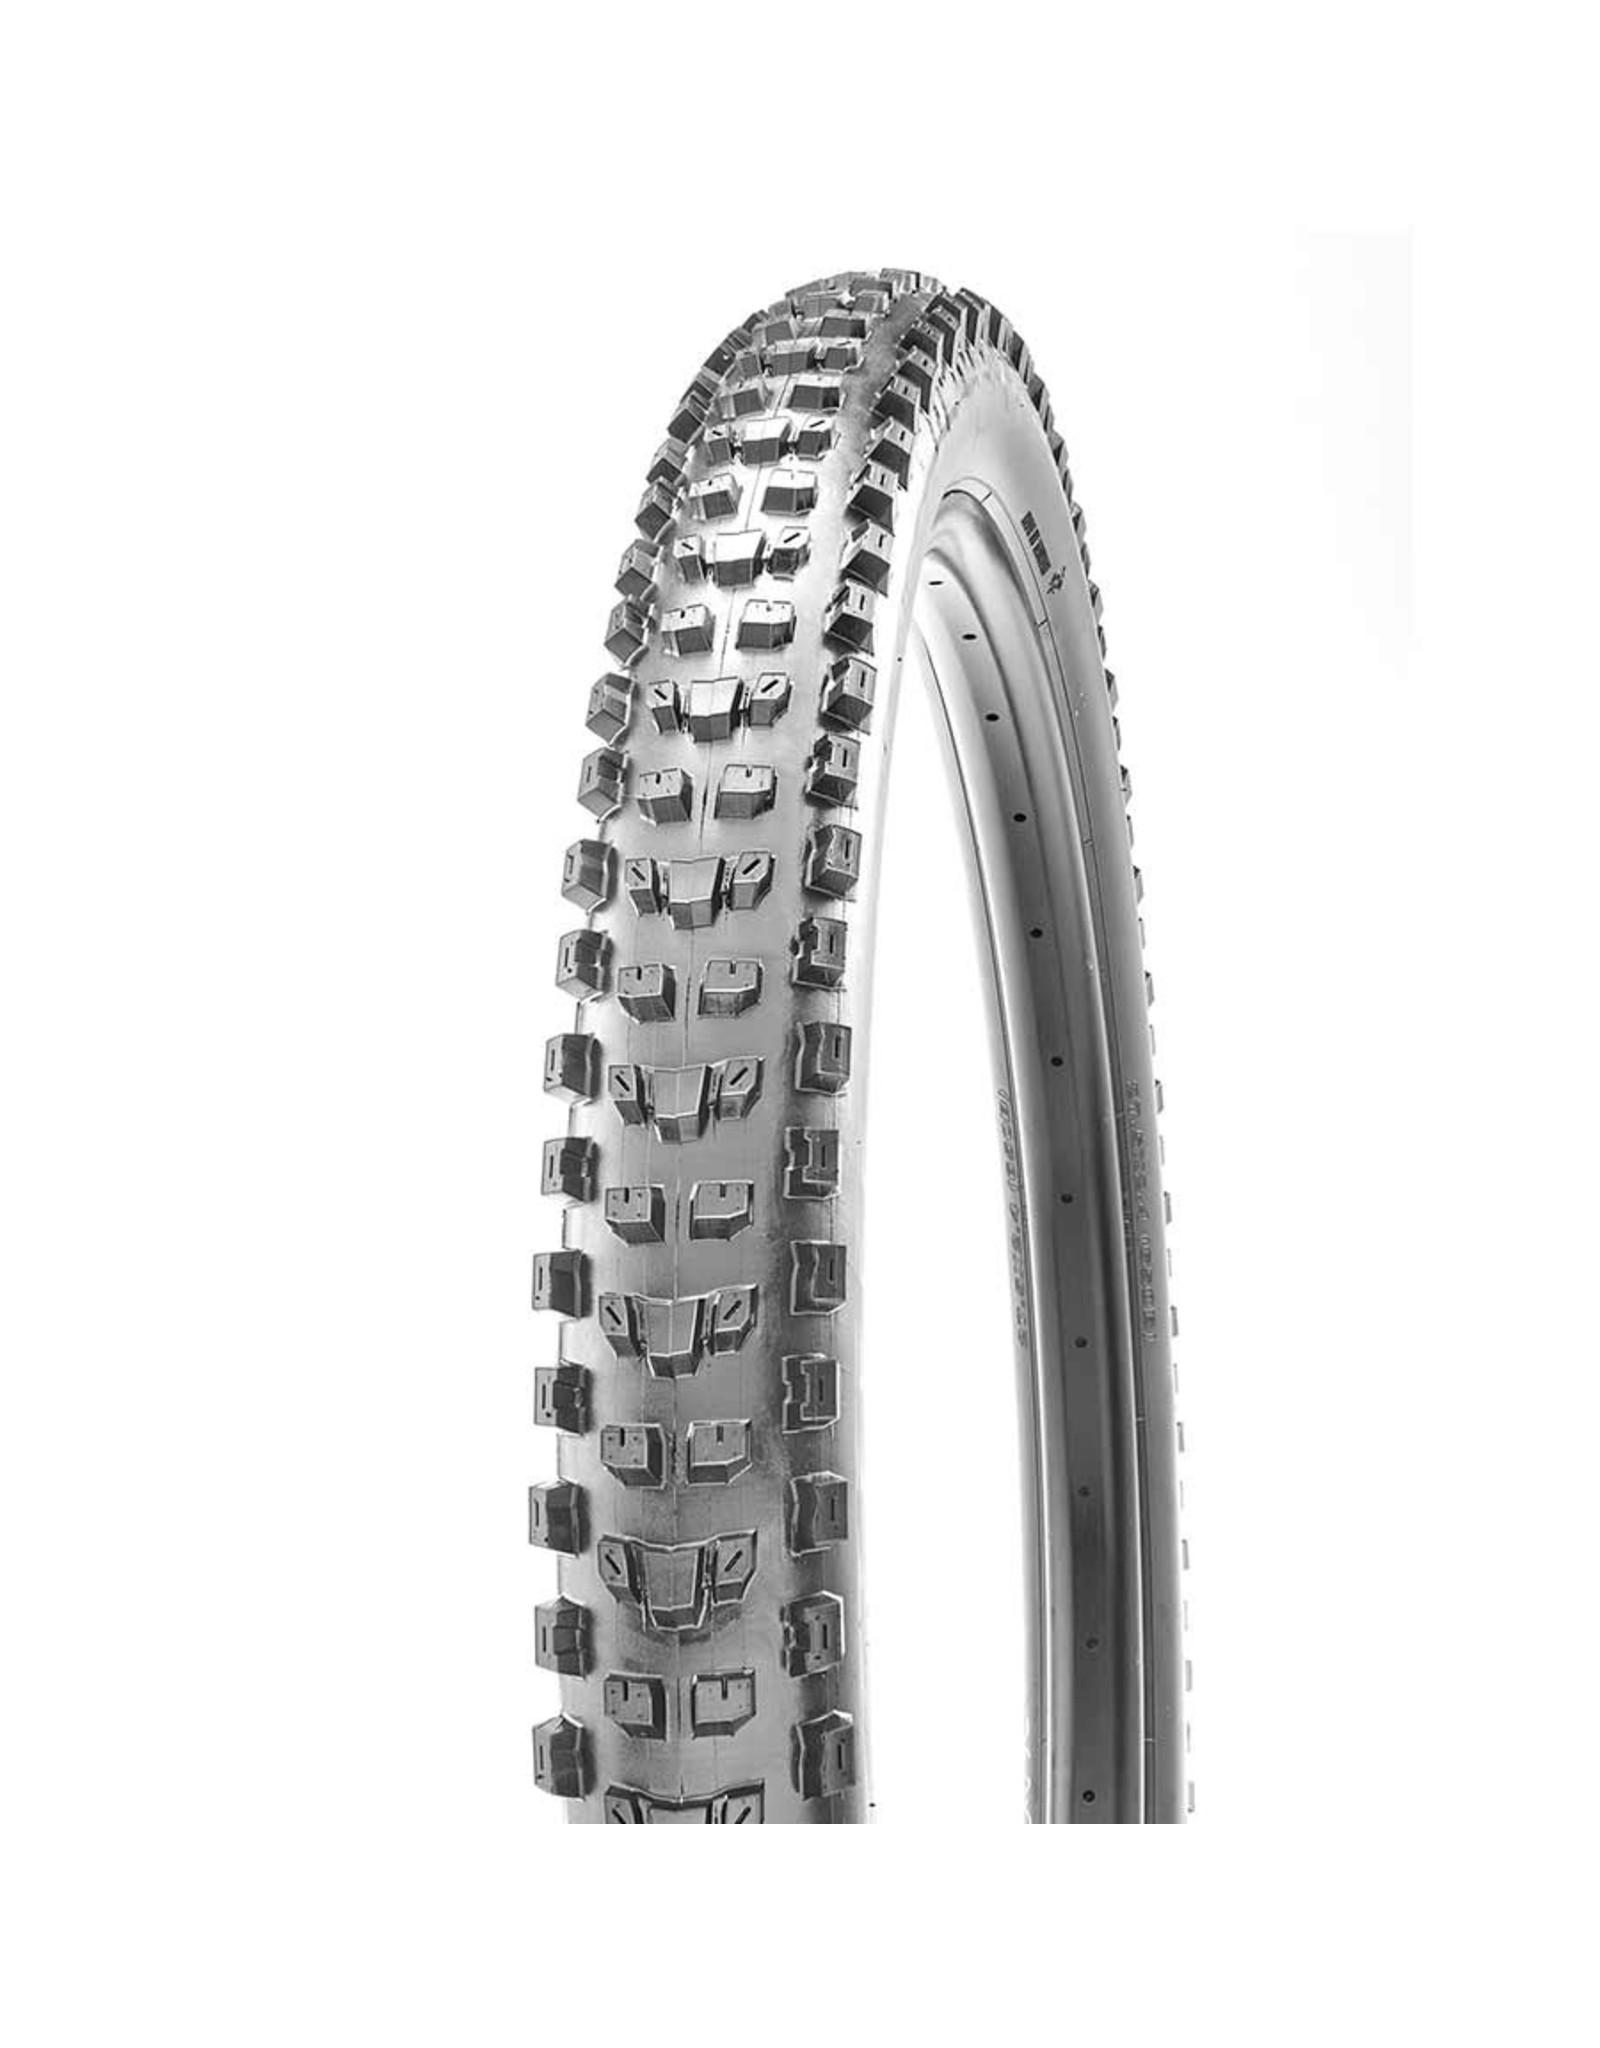 Maxxis, Dissector, Tire, 27.5''x2.40, Folding, Tubeless Ready, 3C Maxx Terra, EXO, Wide Trail, 60TPI, Black